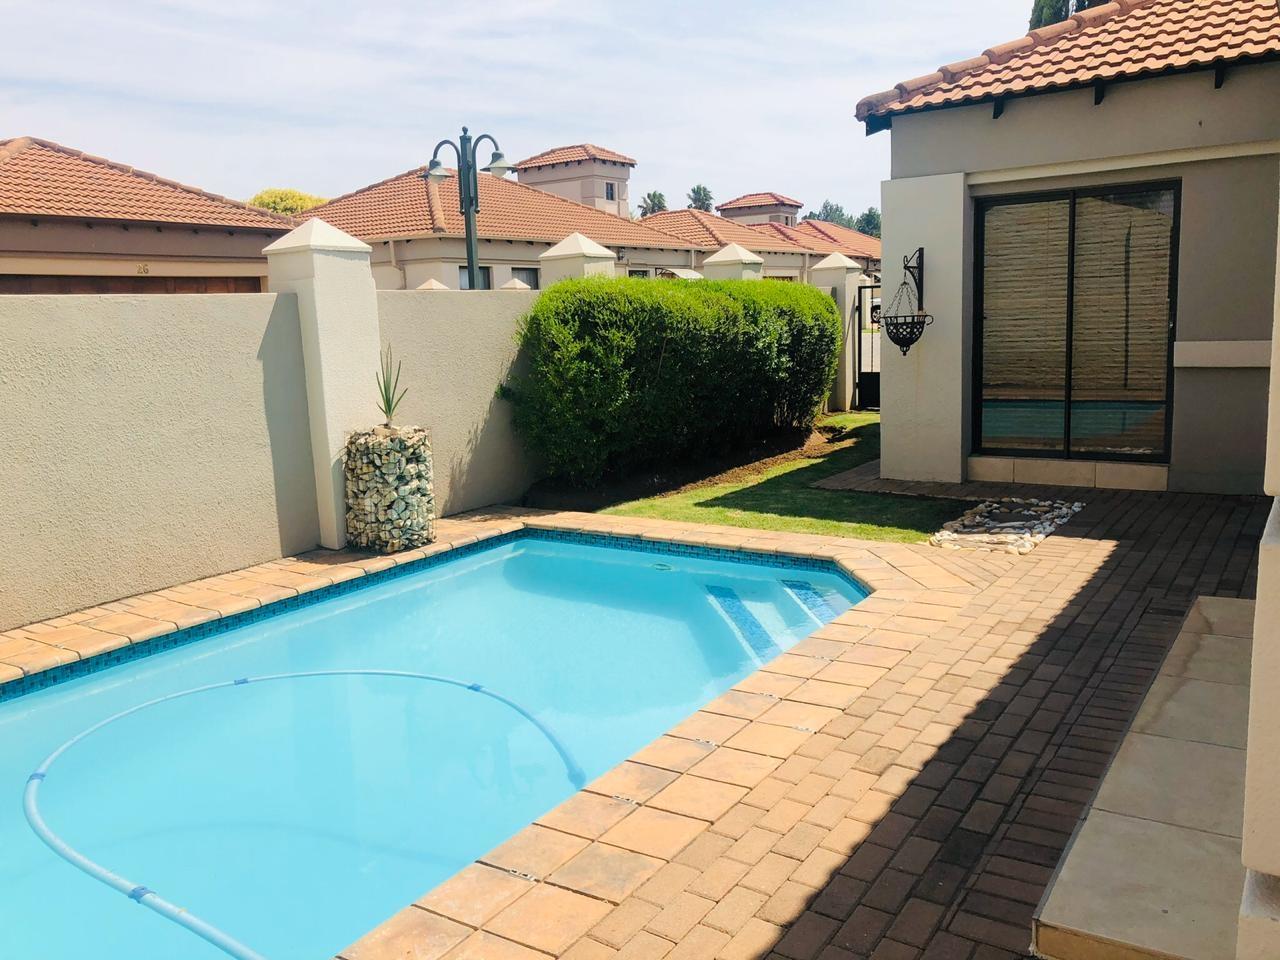 Private swimming pool in garden